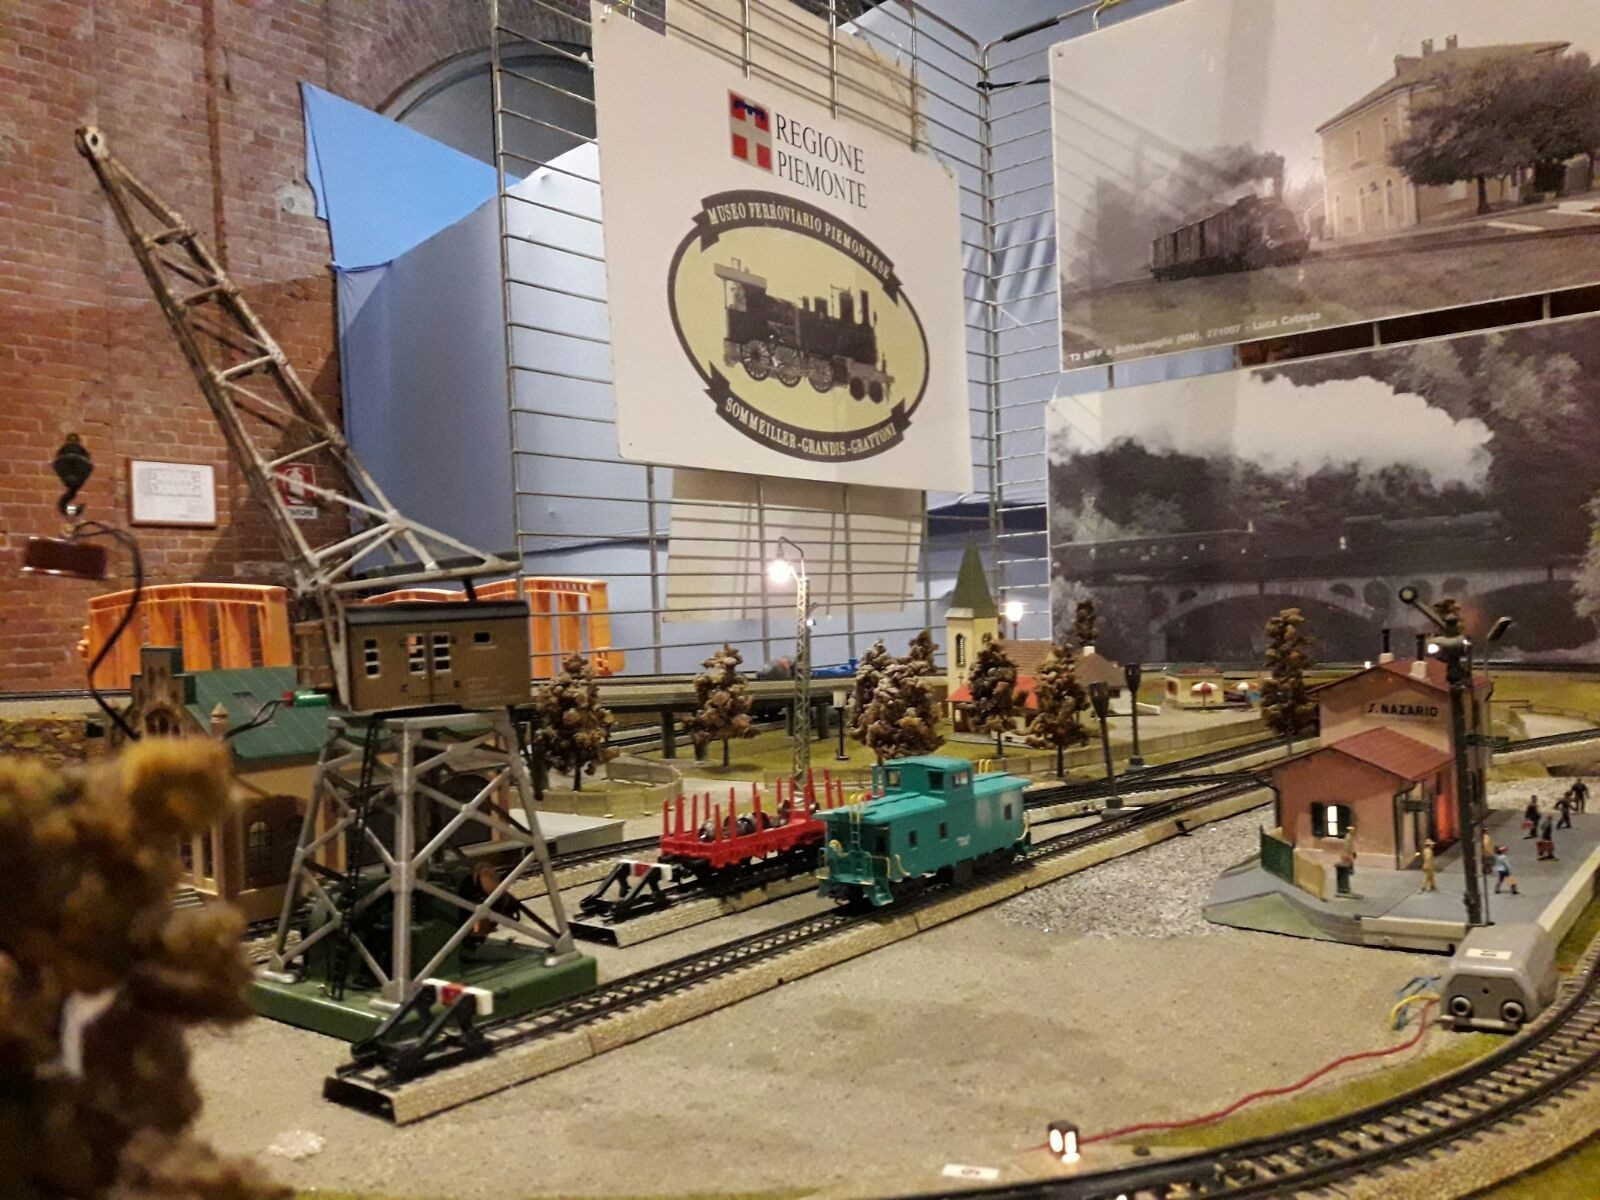 GG 5 gen arriva la befana in treno museo ferroviario piemontese